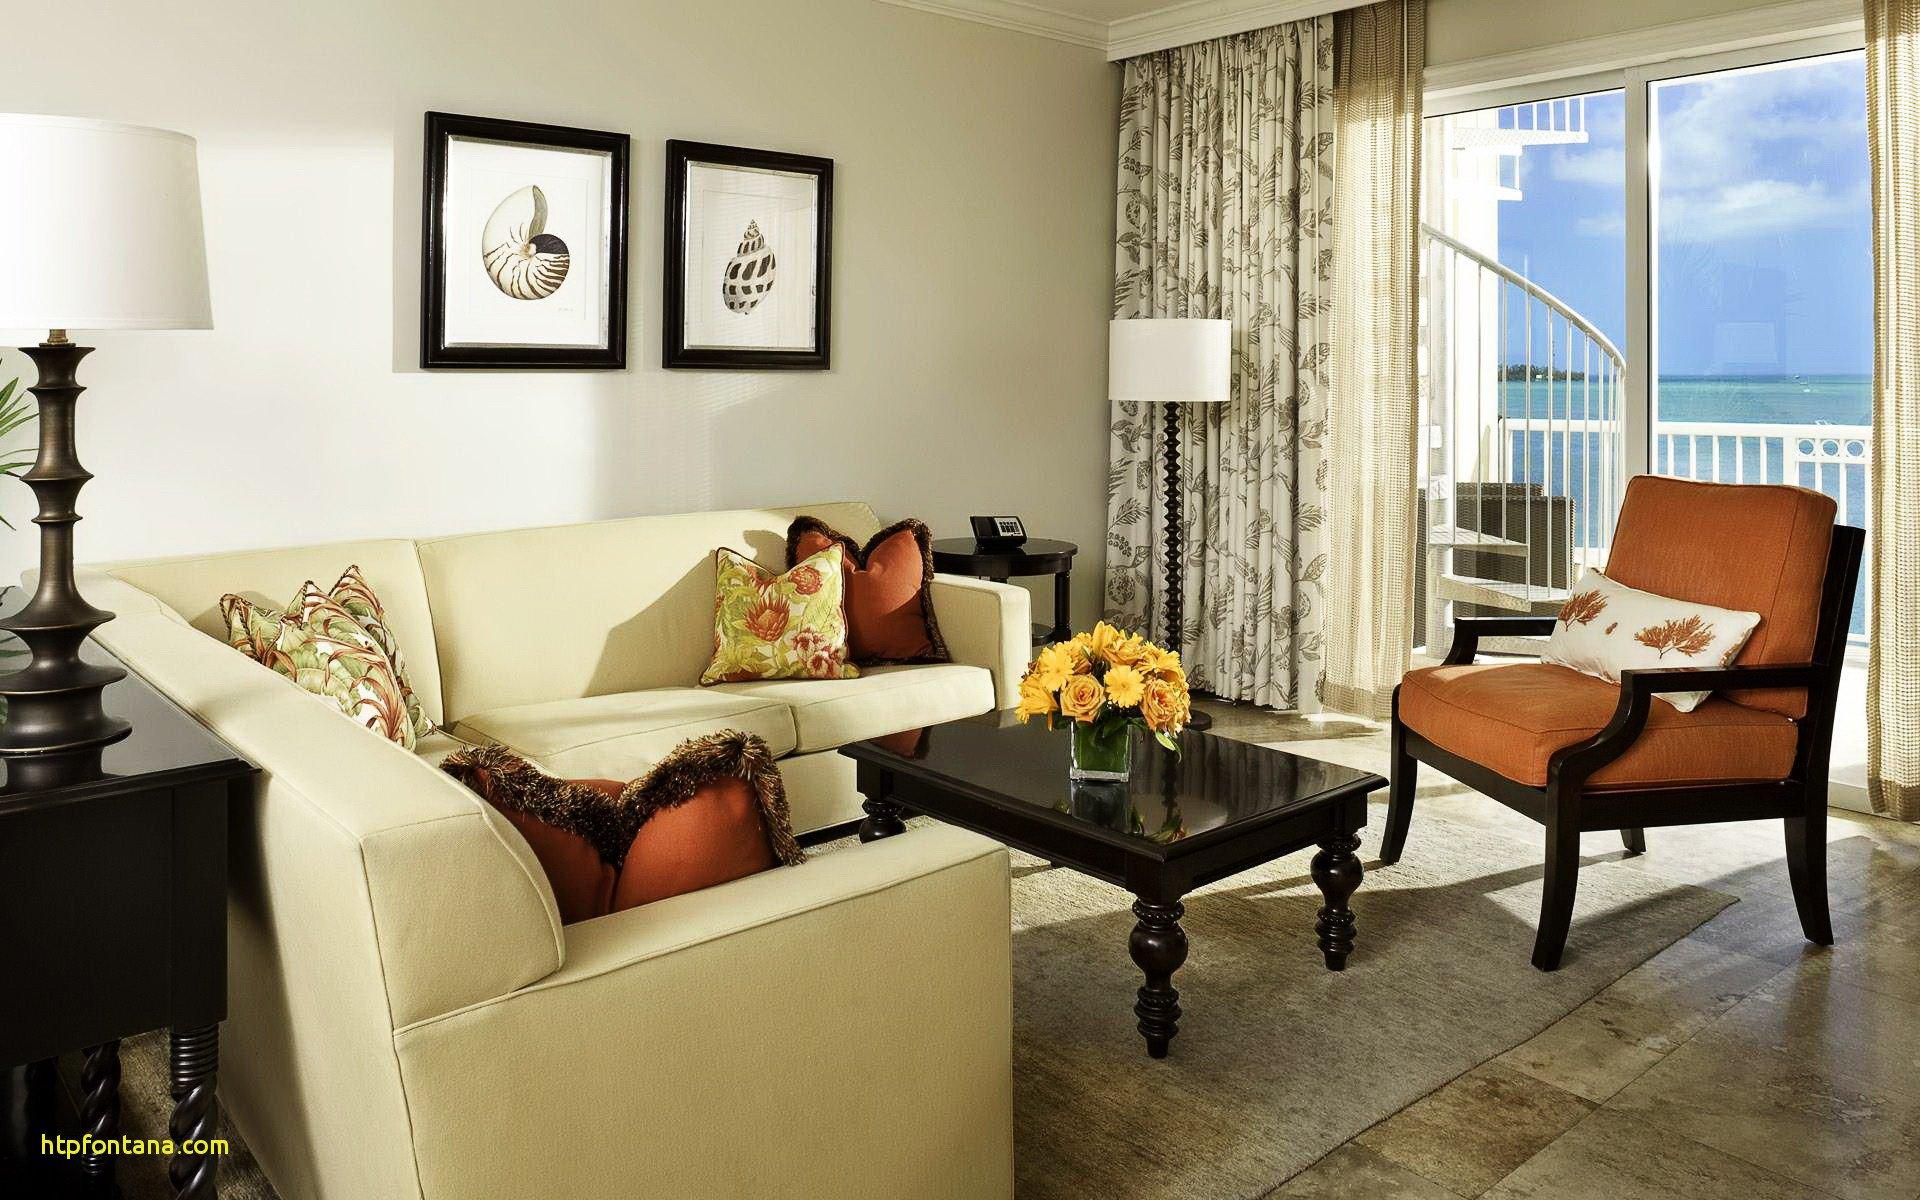 Sage Green Bedroom Ideas Unique Burnt orange and Grey Living Room Decor Luxury Small Design